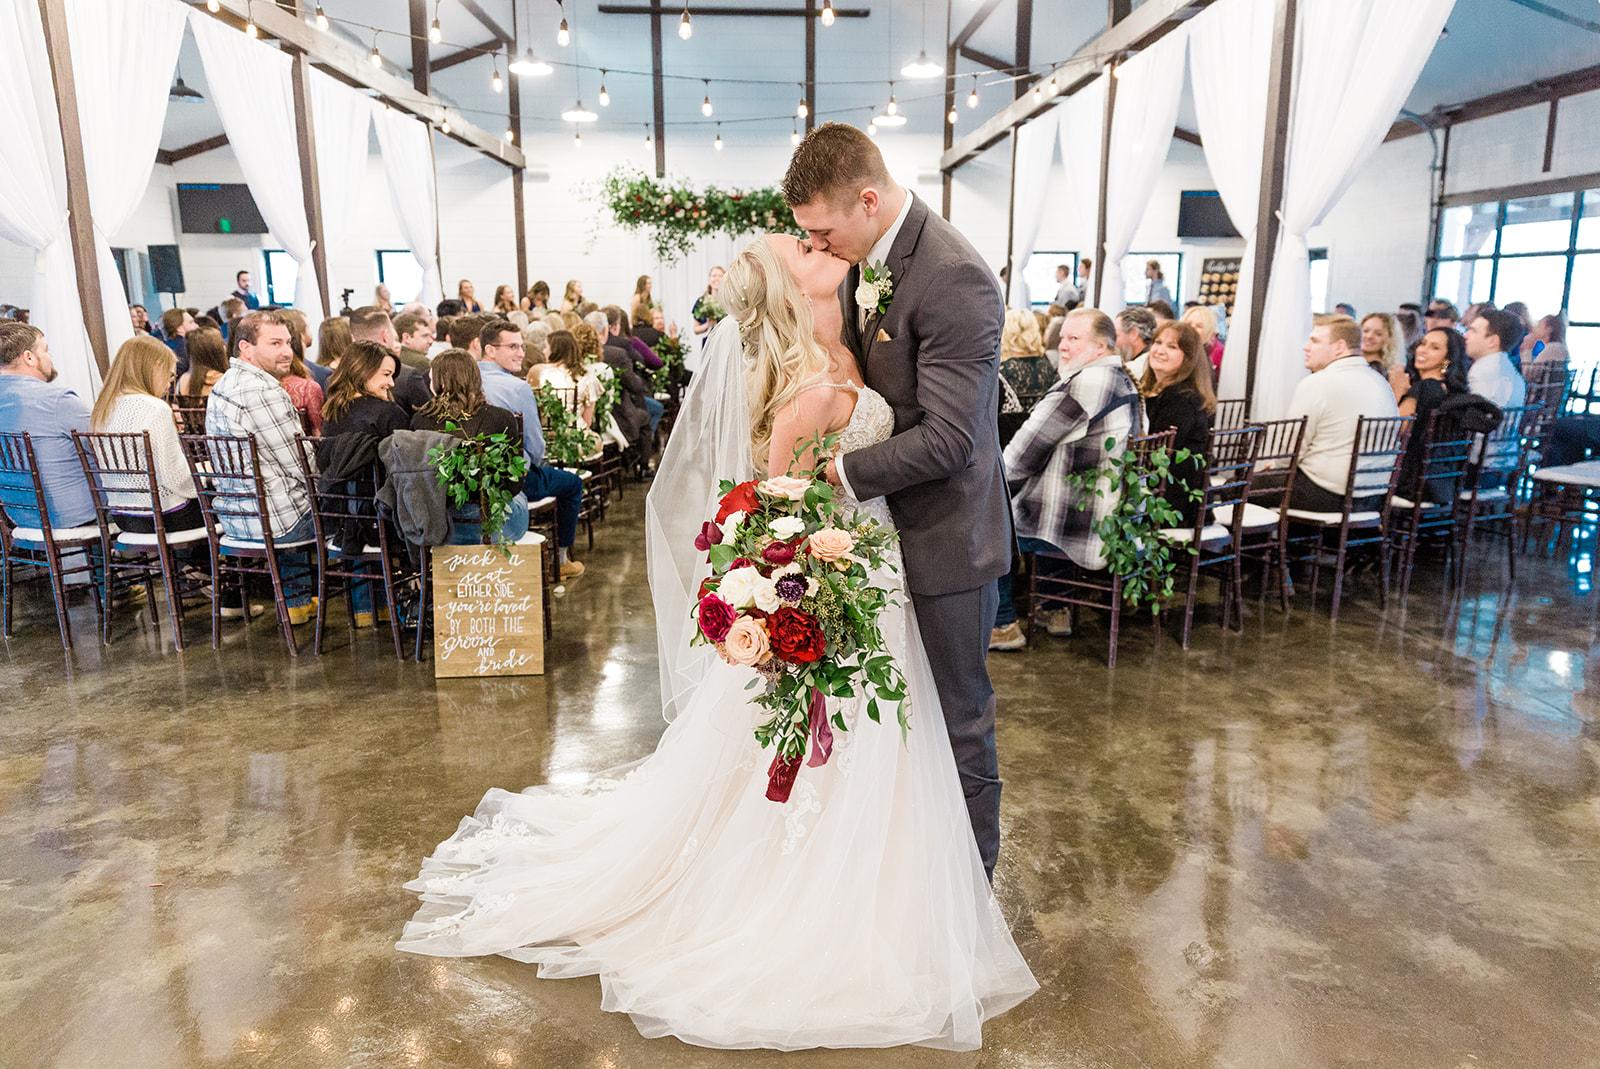 Bixby Tulsa Wedding Venues 32k.jpg